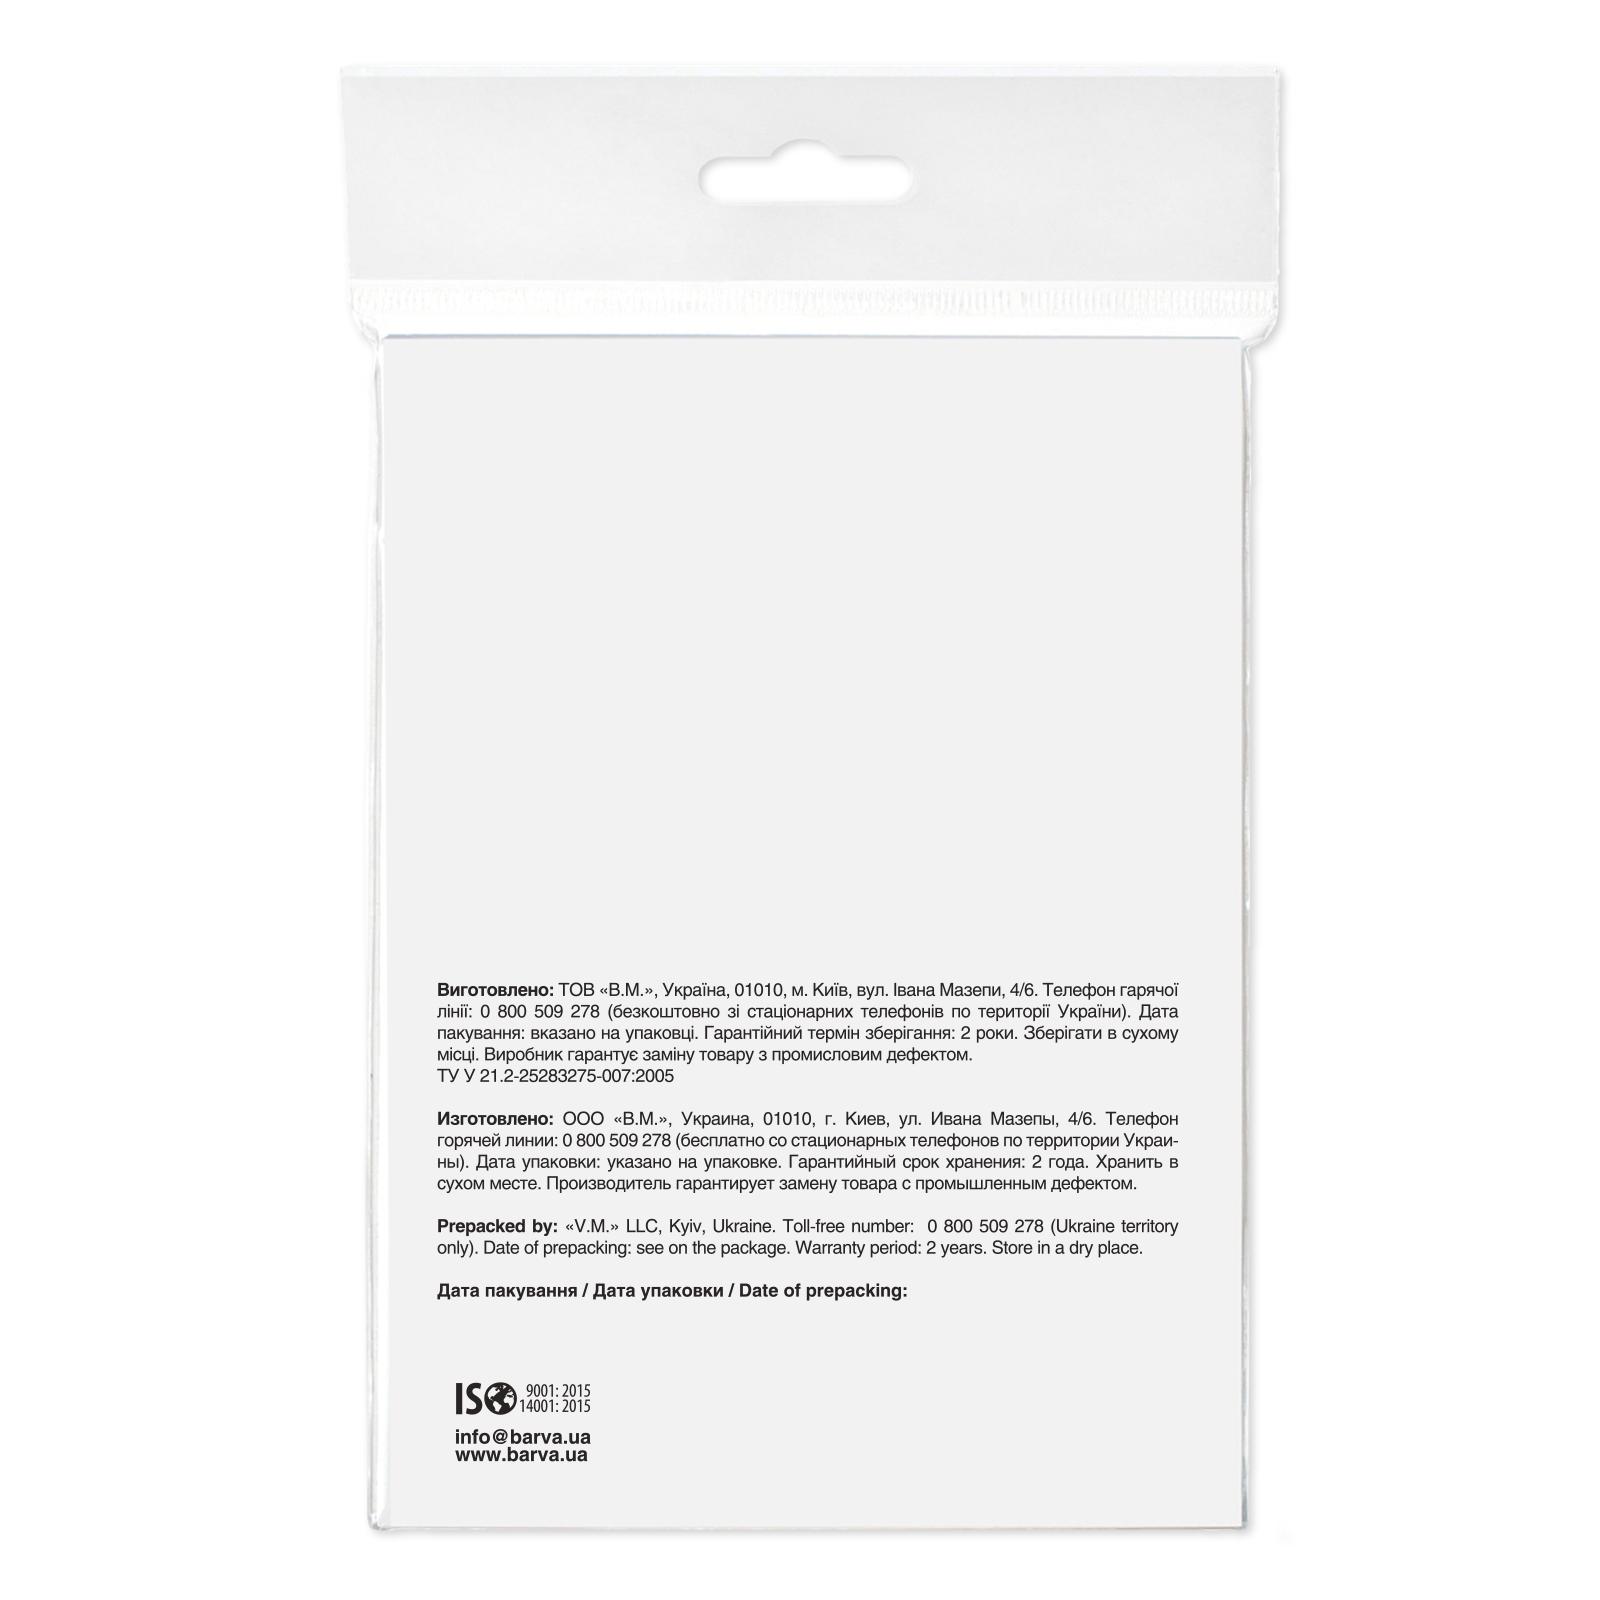 Бумага Barva 13x18, 200g/m2, Original Glossy, 20л (IP-C200-270) изображение 2